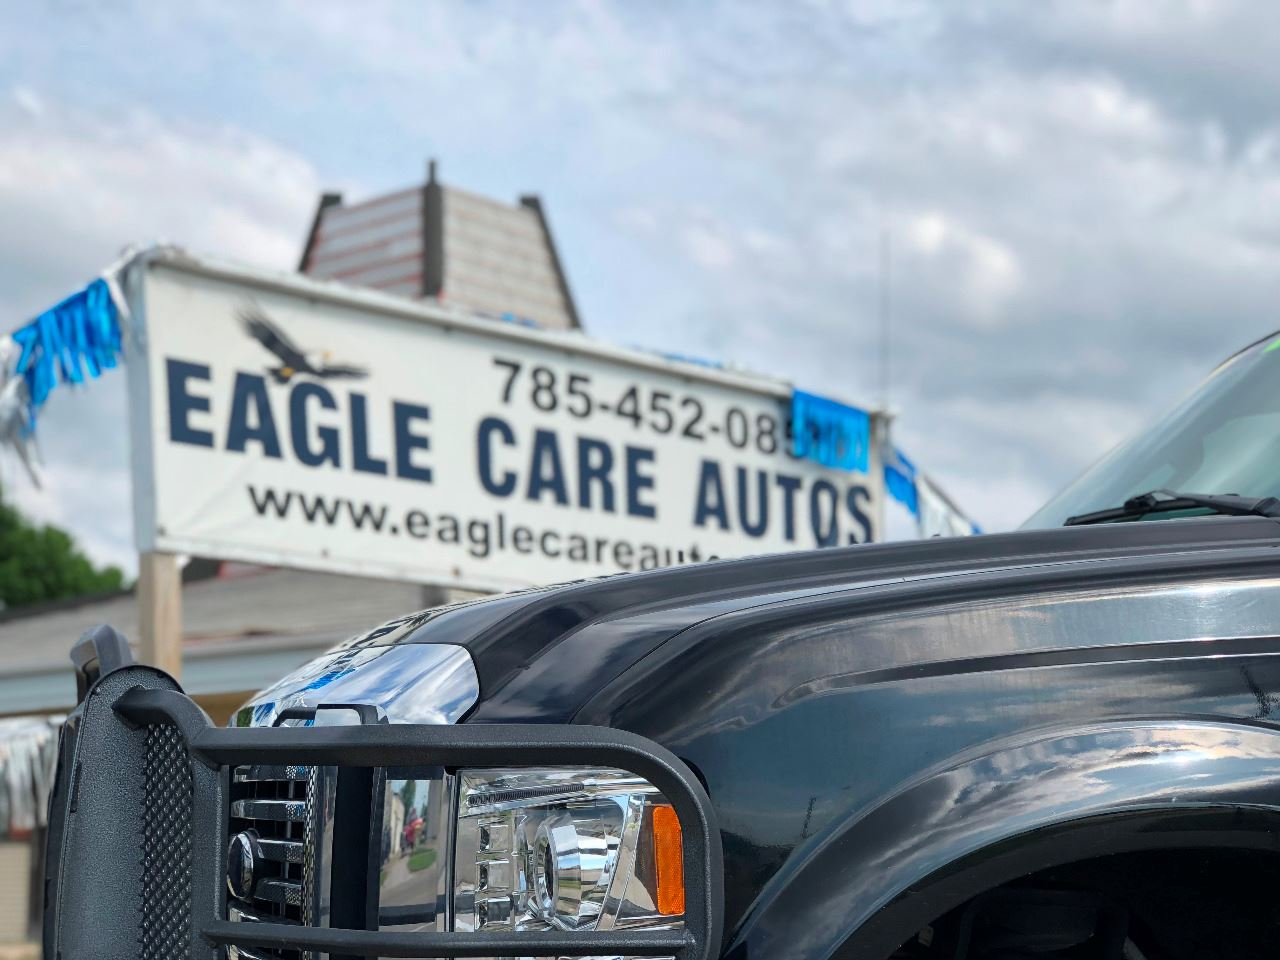 Eagle Care Autos